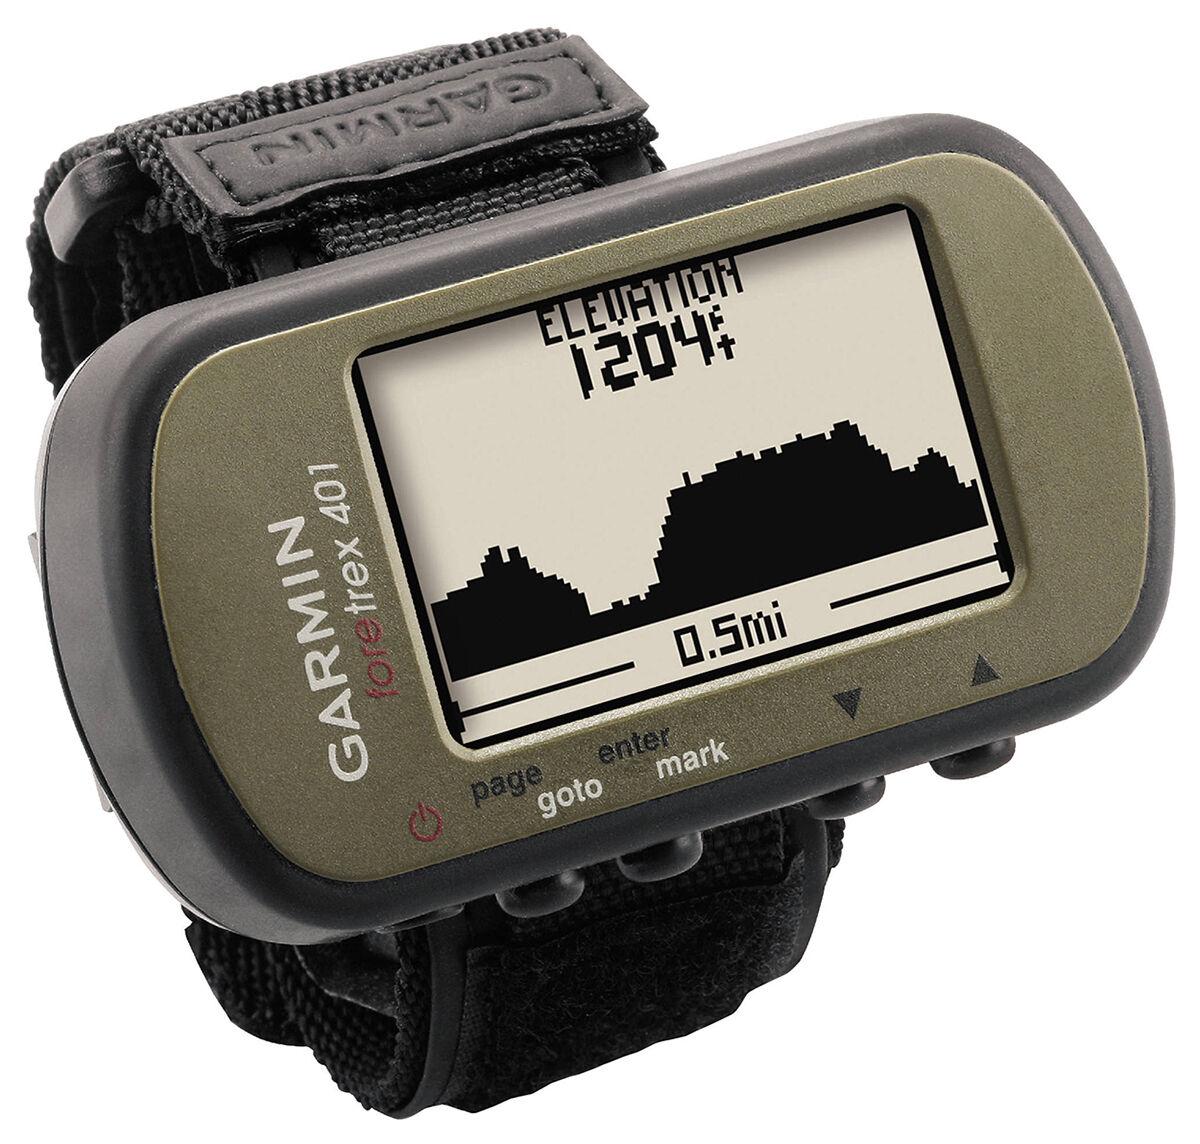 Garmin Foretrex 401 Sistema Waterproof Hiking Gps Sistema 401 W electrónico Brújula Altímetro ee6587